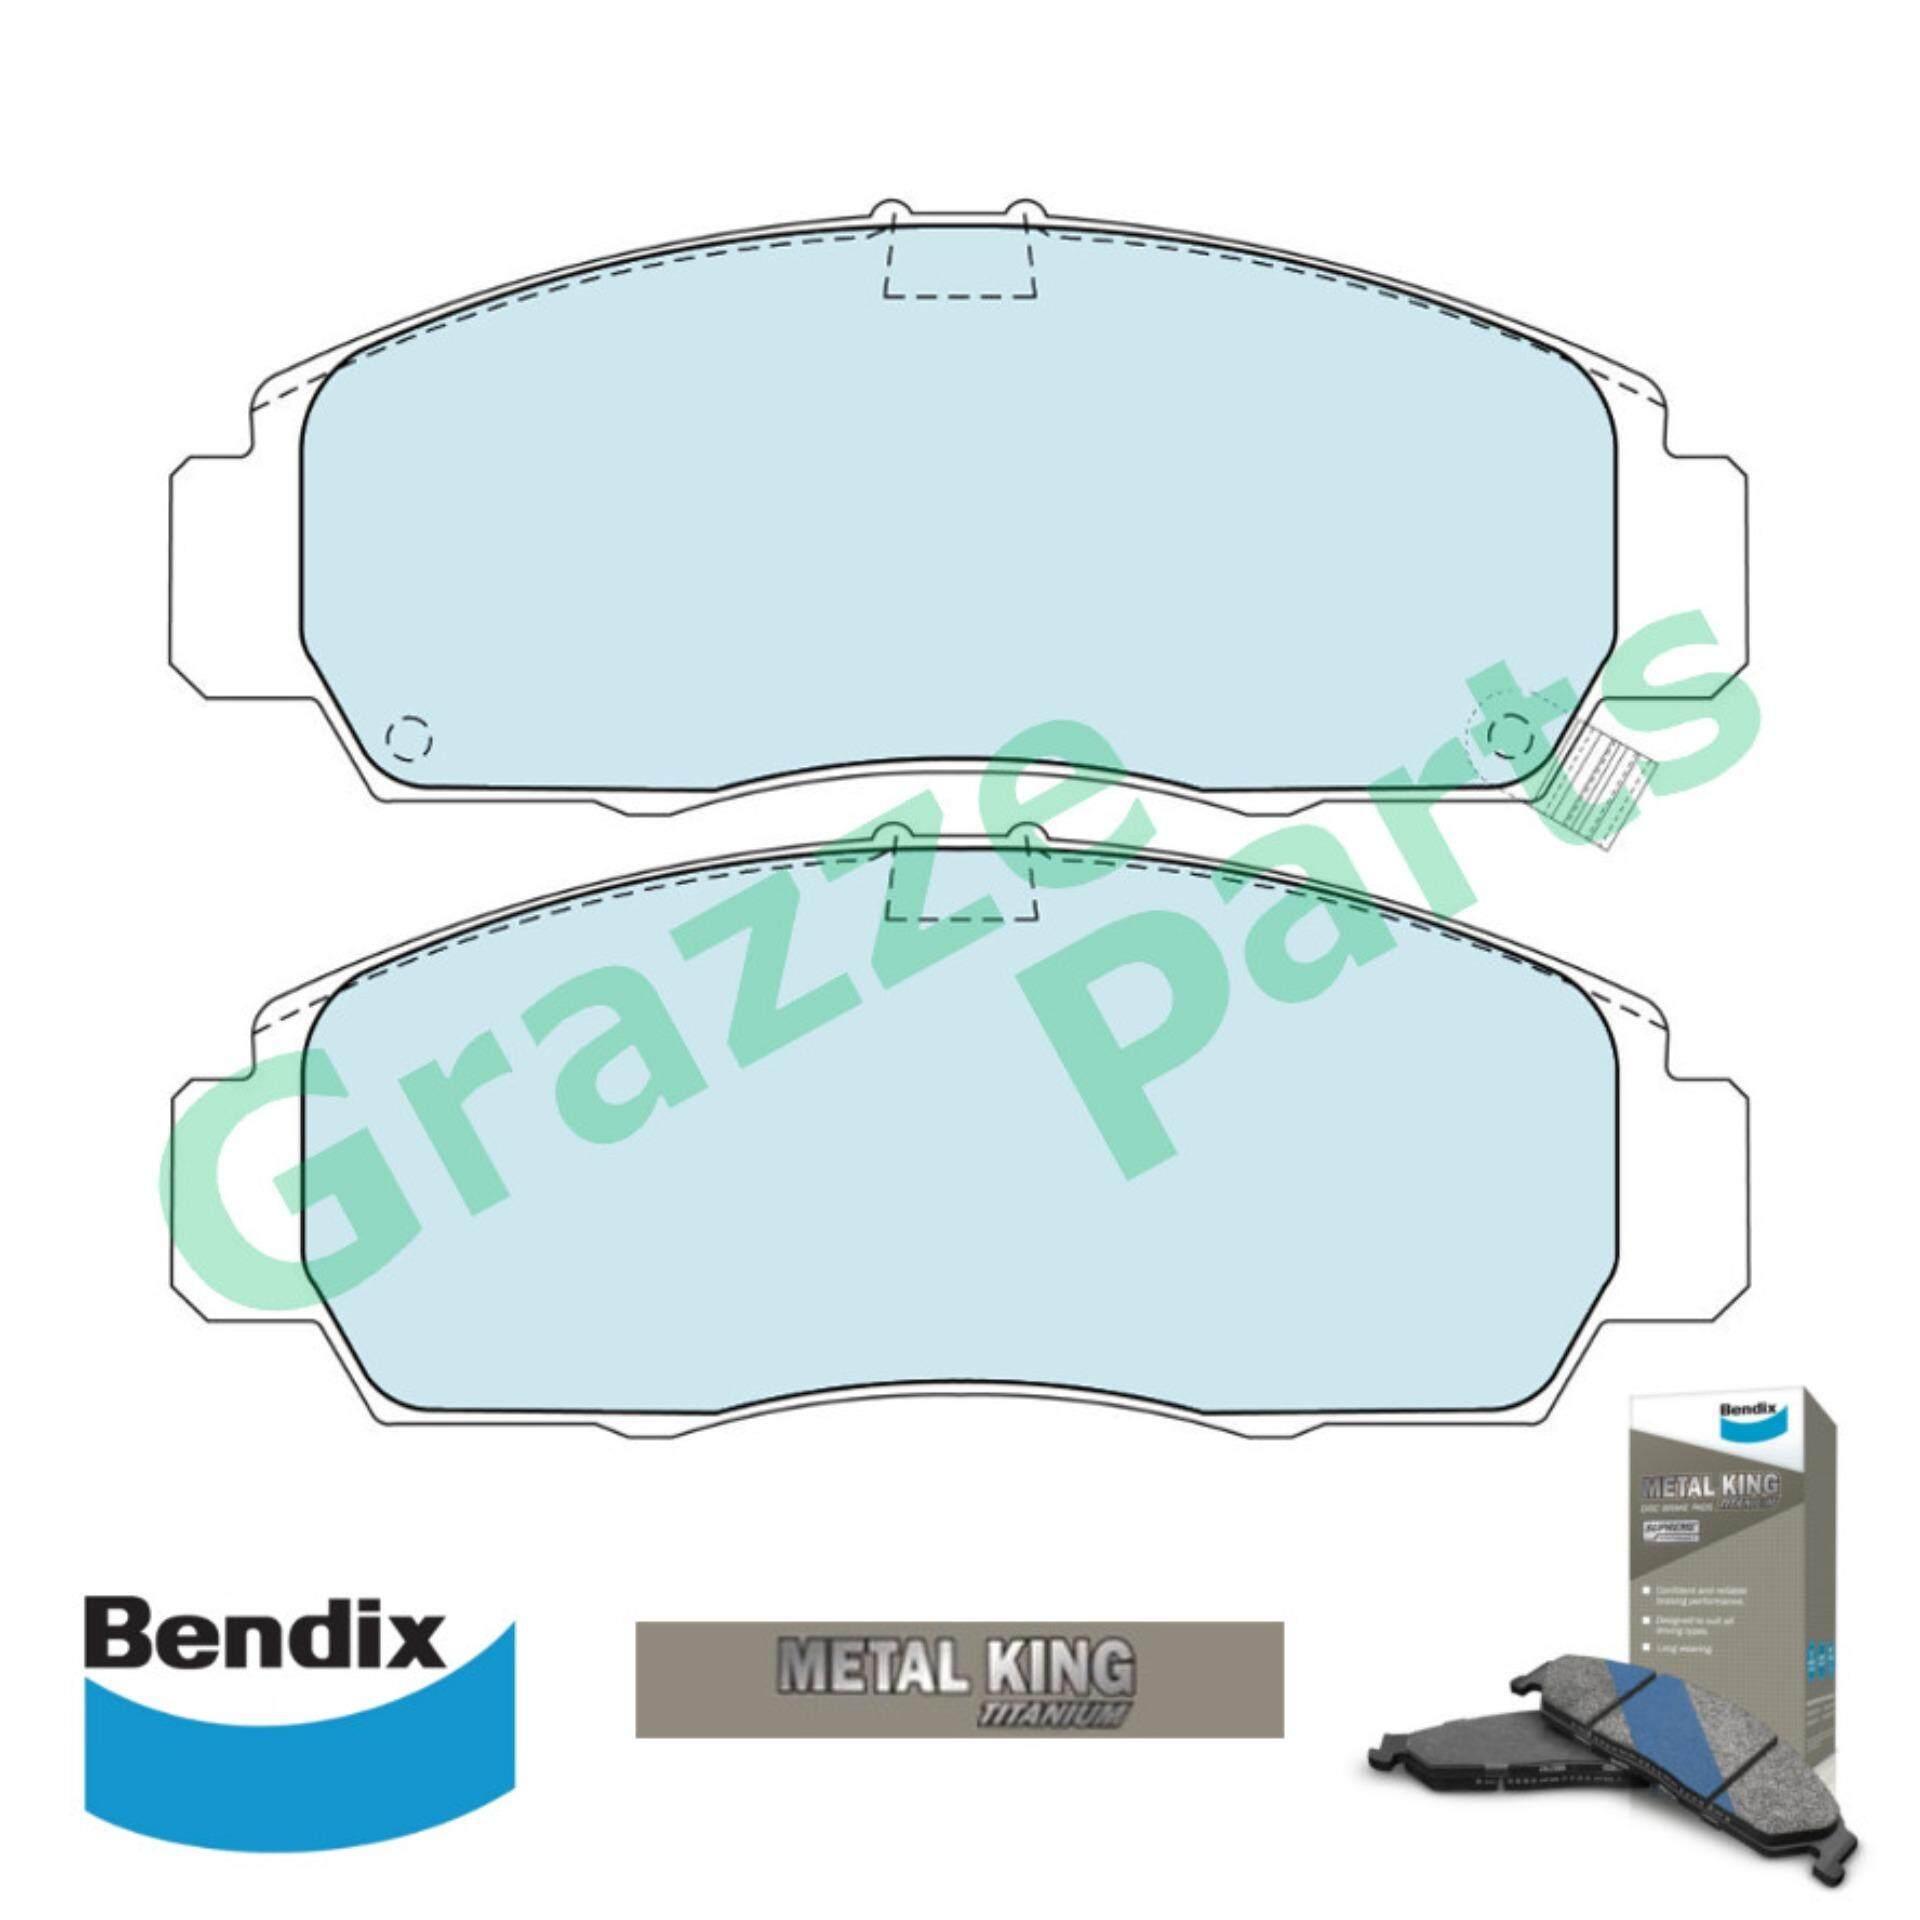 Bendix Metal King Titanium Disc Brake Pad Front for DB1393 - Honda Accord SDA TAO CIVIC FD SNA Stream S7A Odyssey RB1